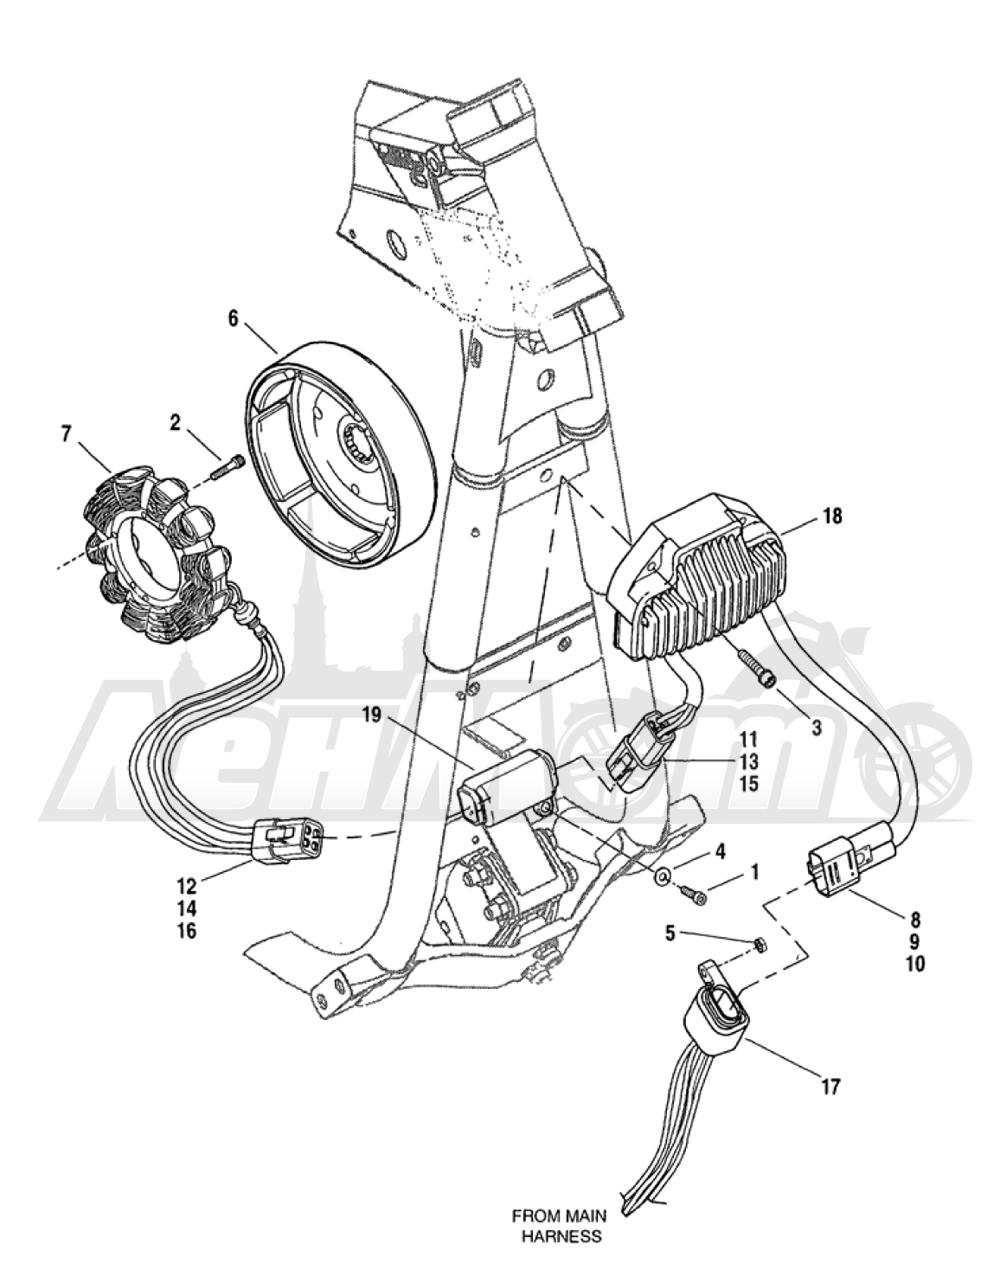 Запчасти для Мотоцикла Harley-Davidson 2005 FXDI DYNA® SUPER GLIDE (INJECTION) (GM) Раздел: ELECTRICAL - ALTERNATOR W/ VOLTAGE REGULATOR | электрика генератор вместе с регулятор напряжения